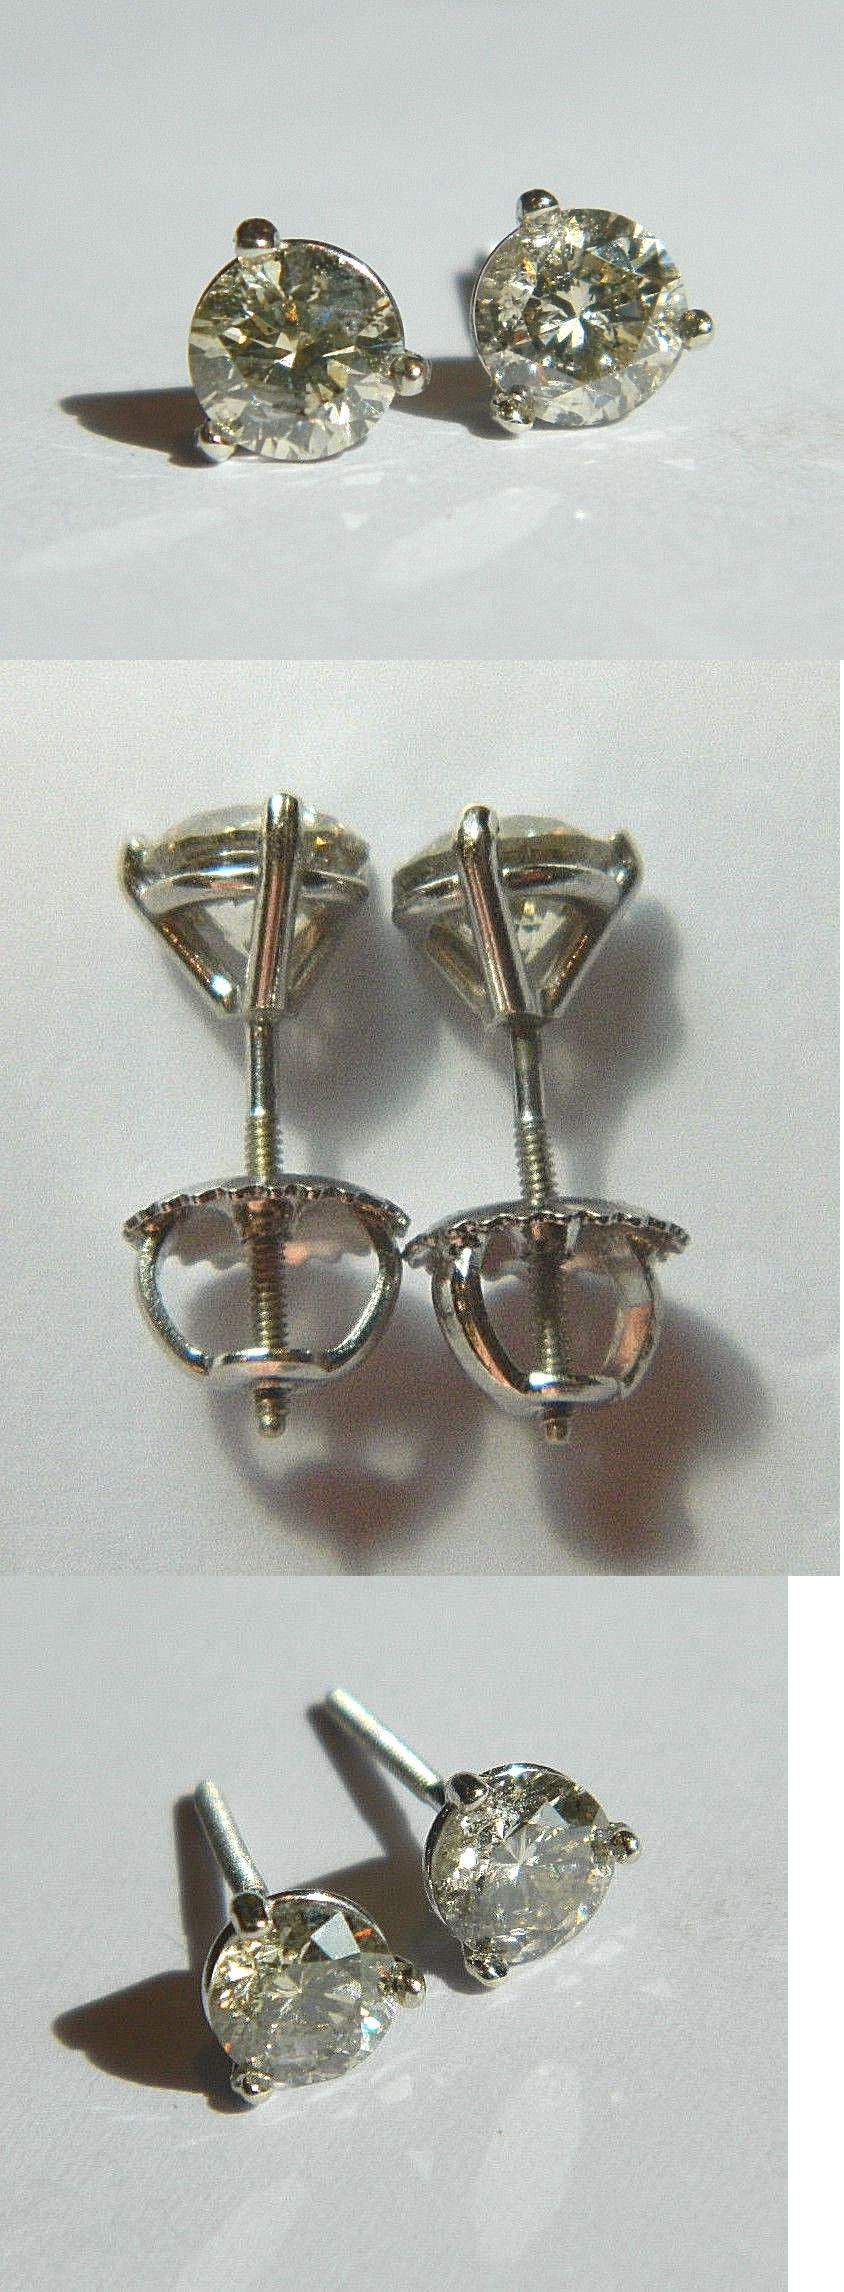 Diamond 1 00 Carat Round Brilliant Cut Diamond Stud